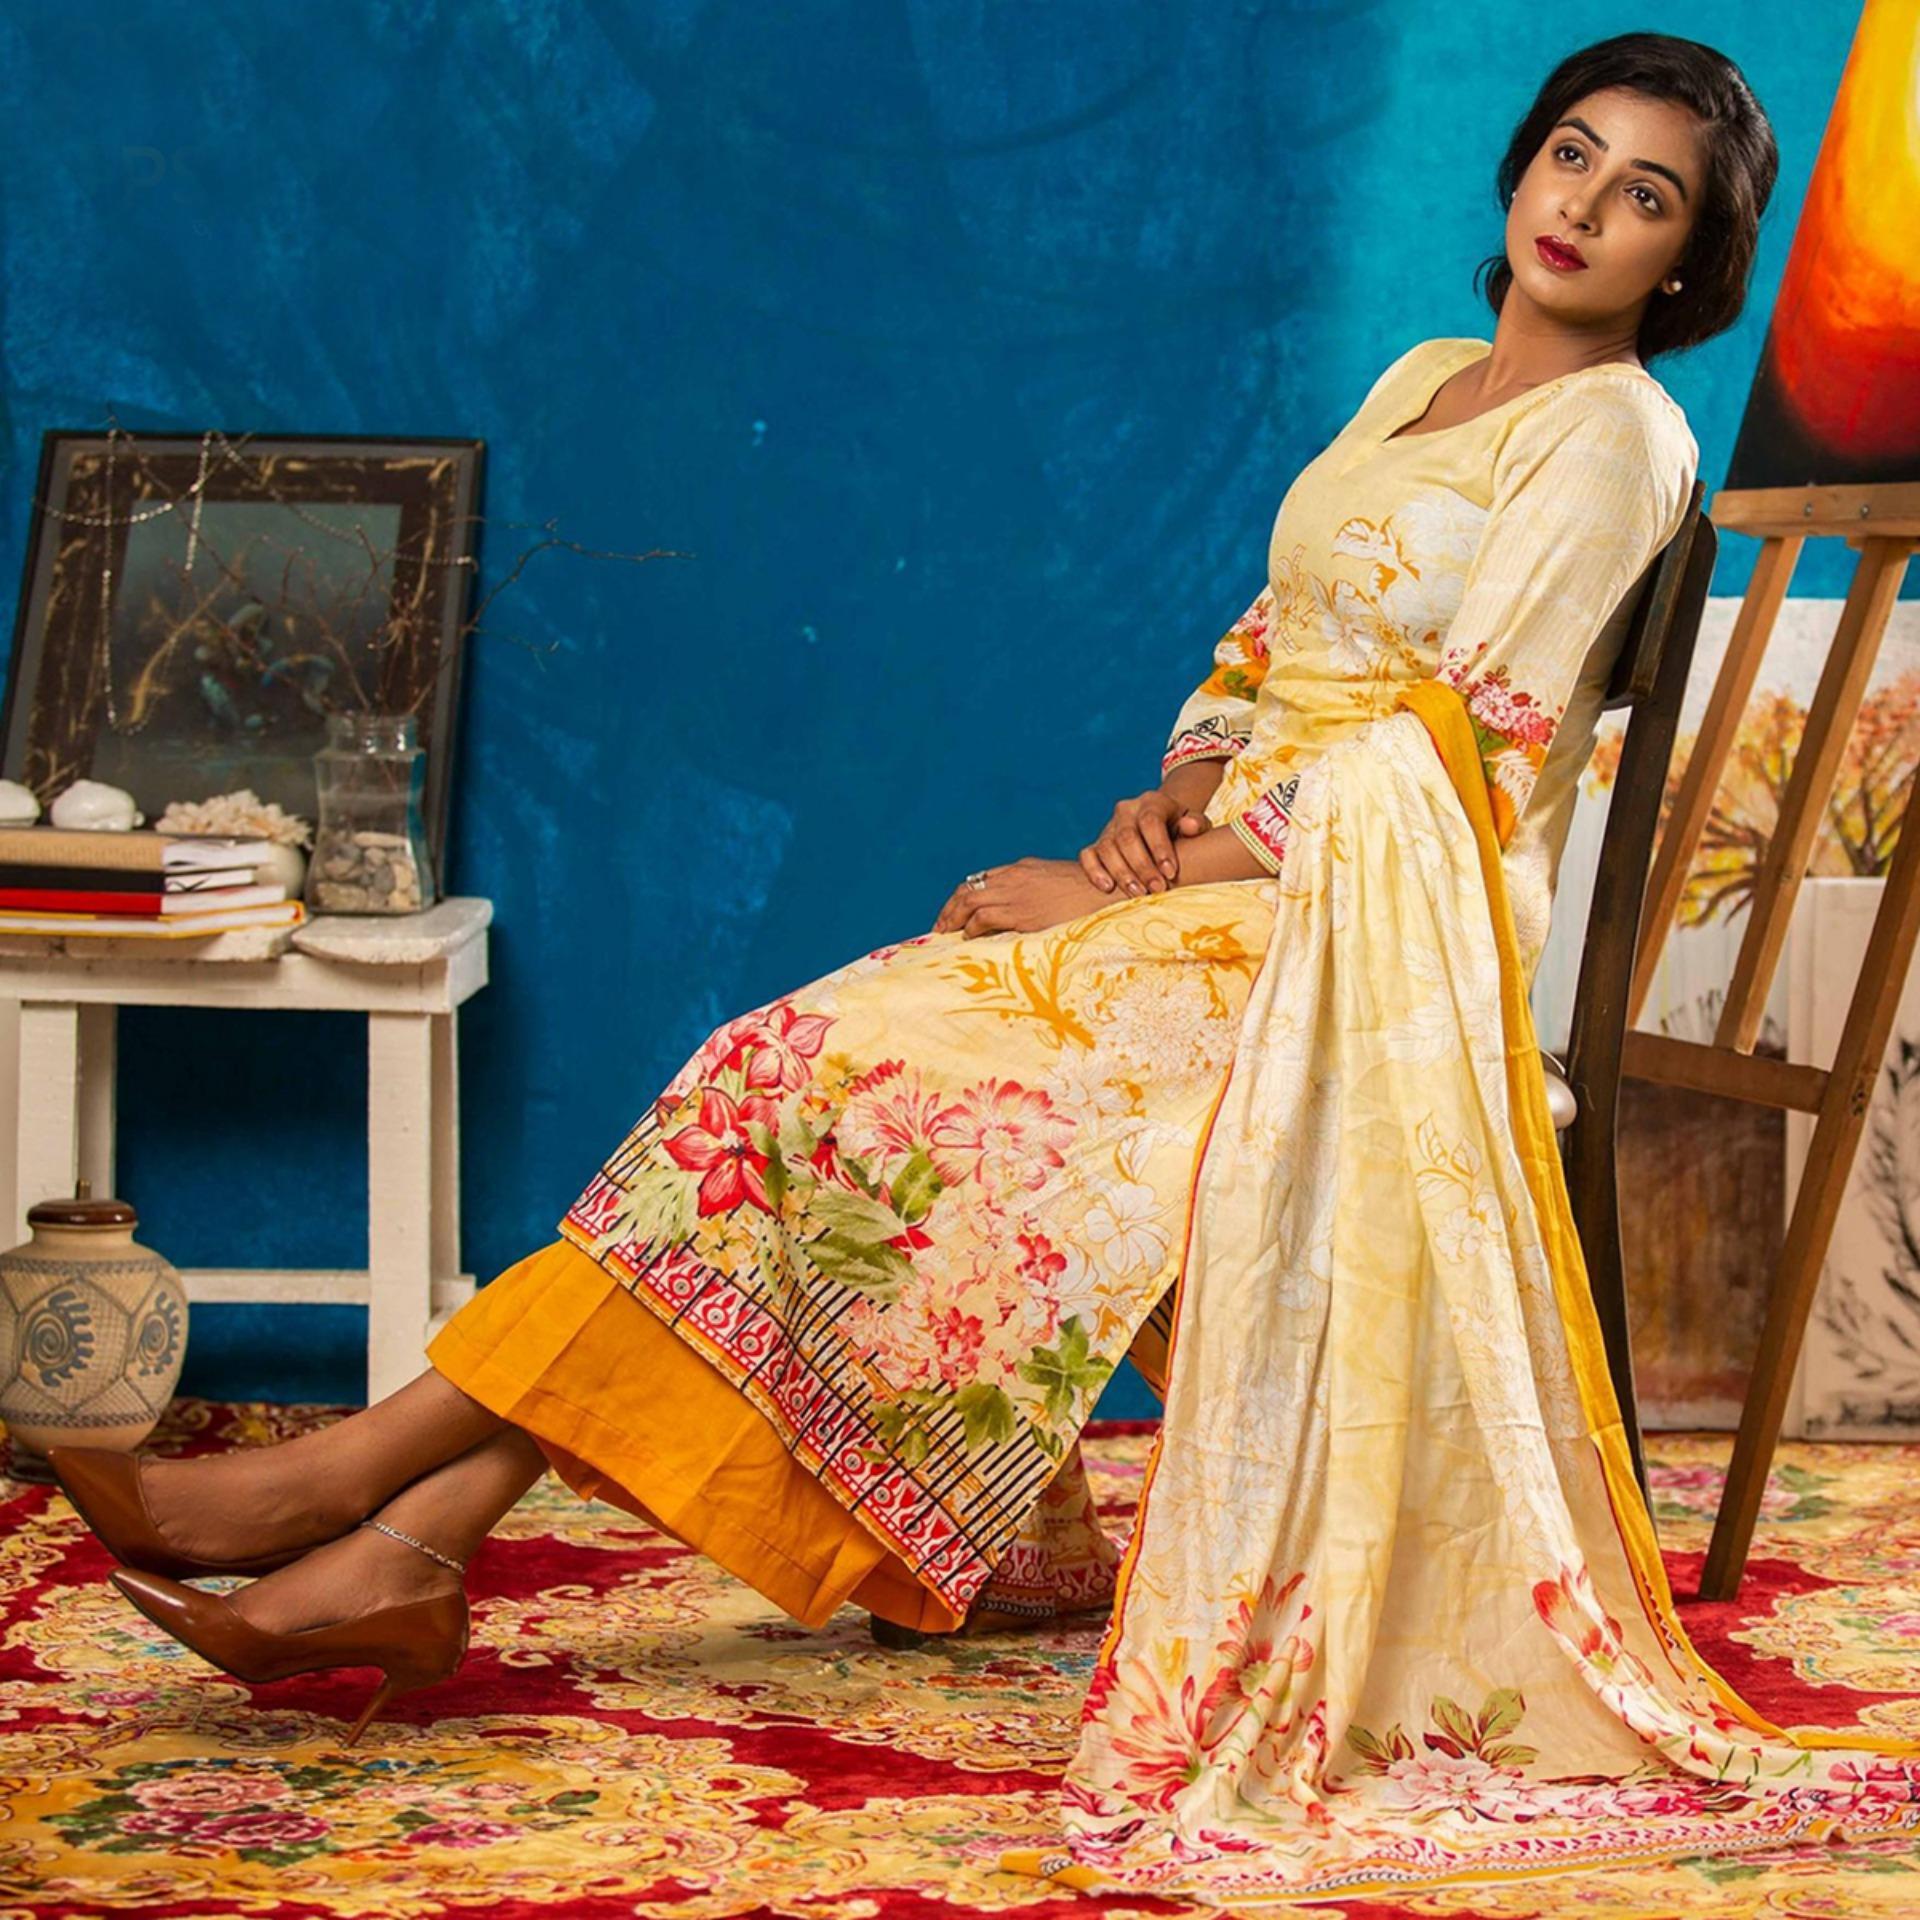 75caee3a99e3f Women's Long Maxi Dress & Party Dress In Bangladesh - Daraz.com.bd